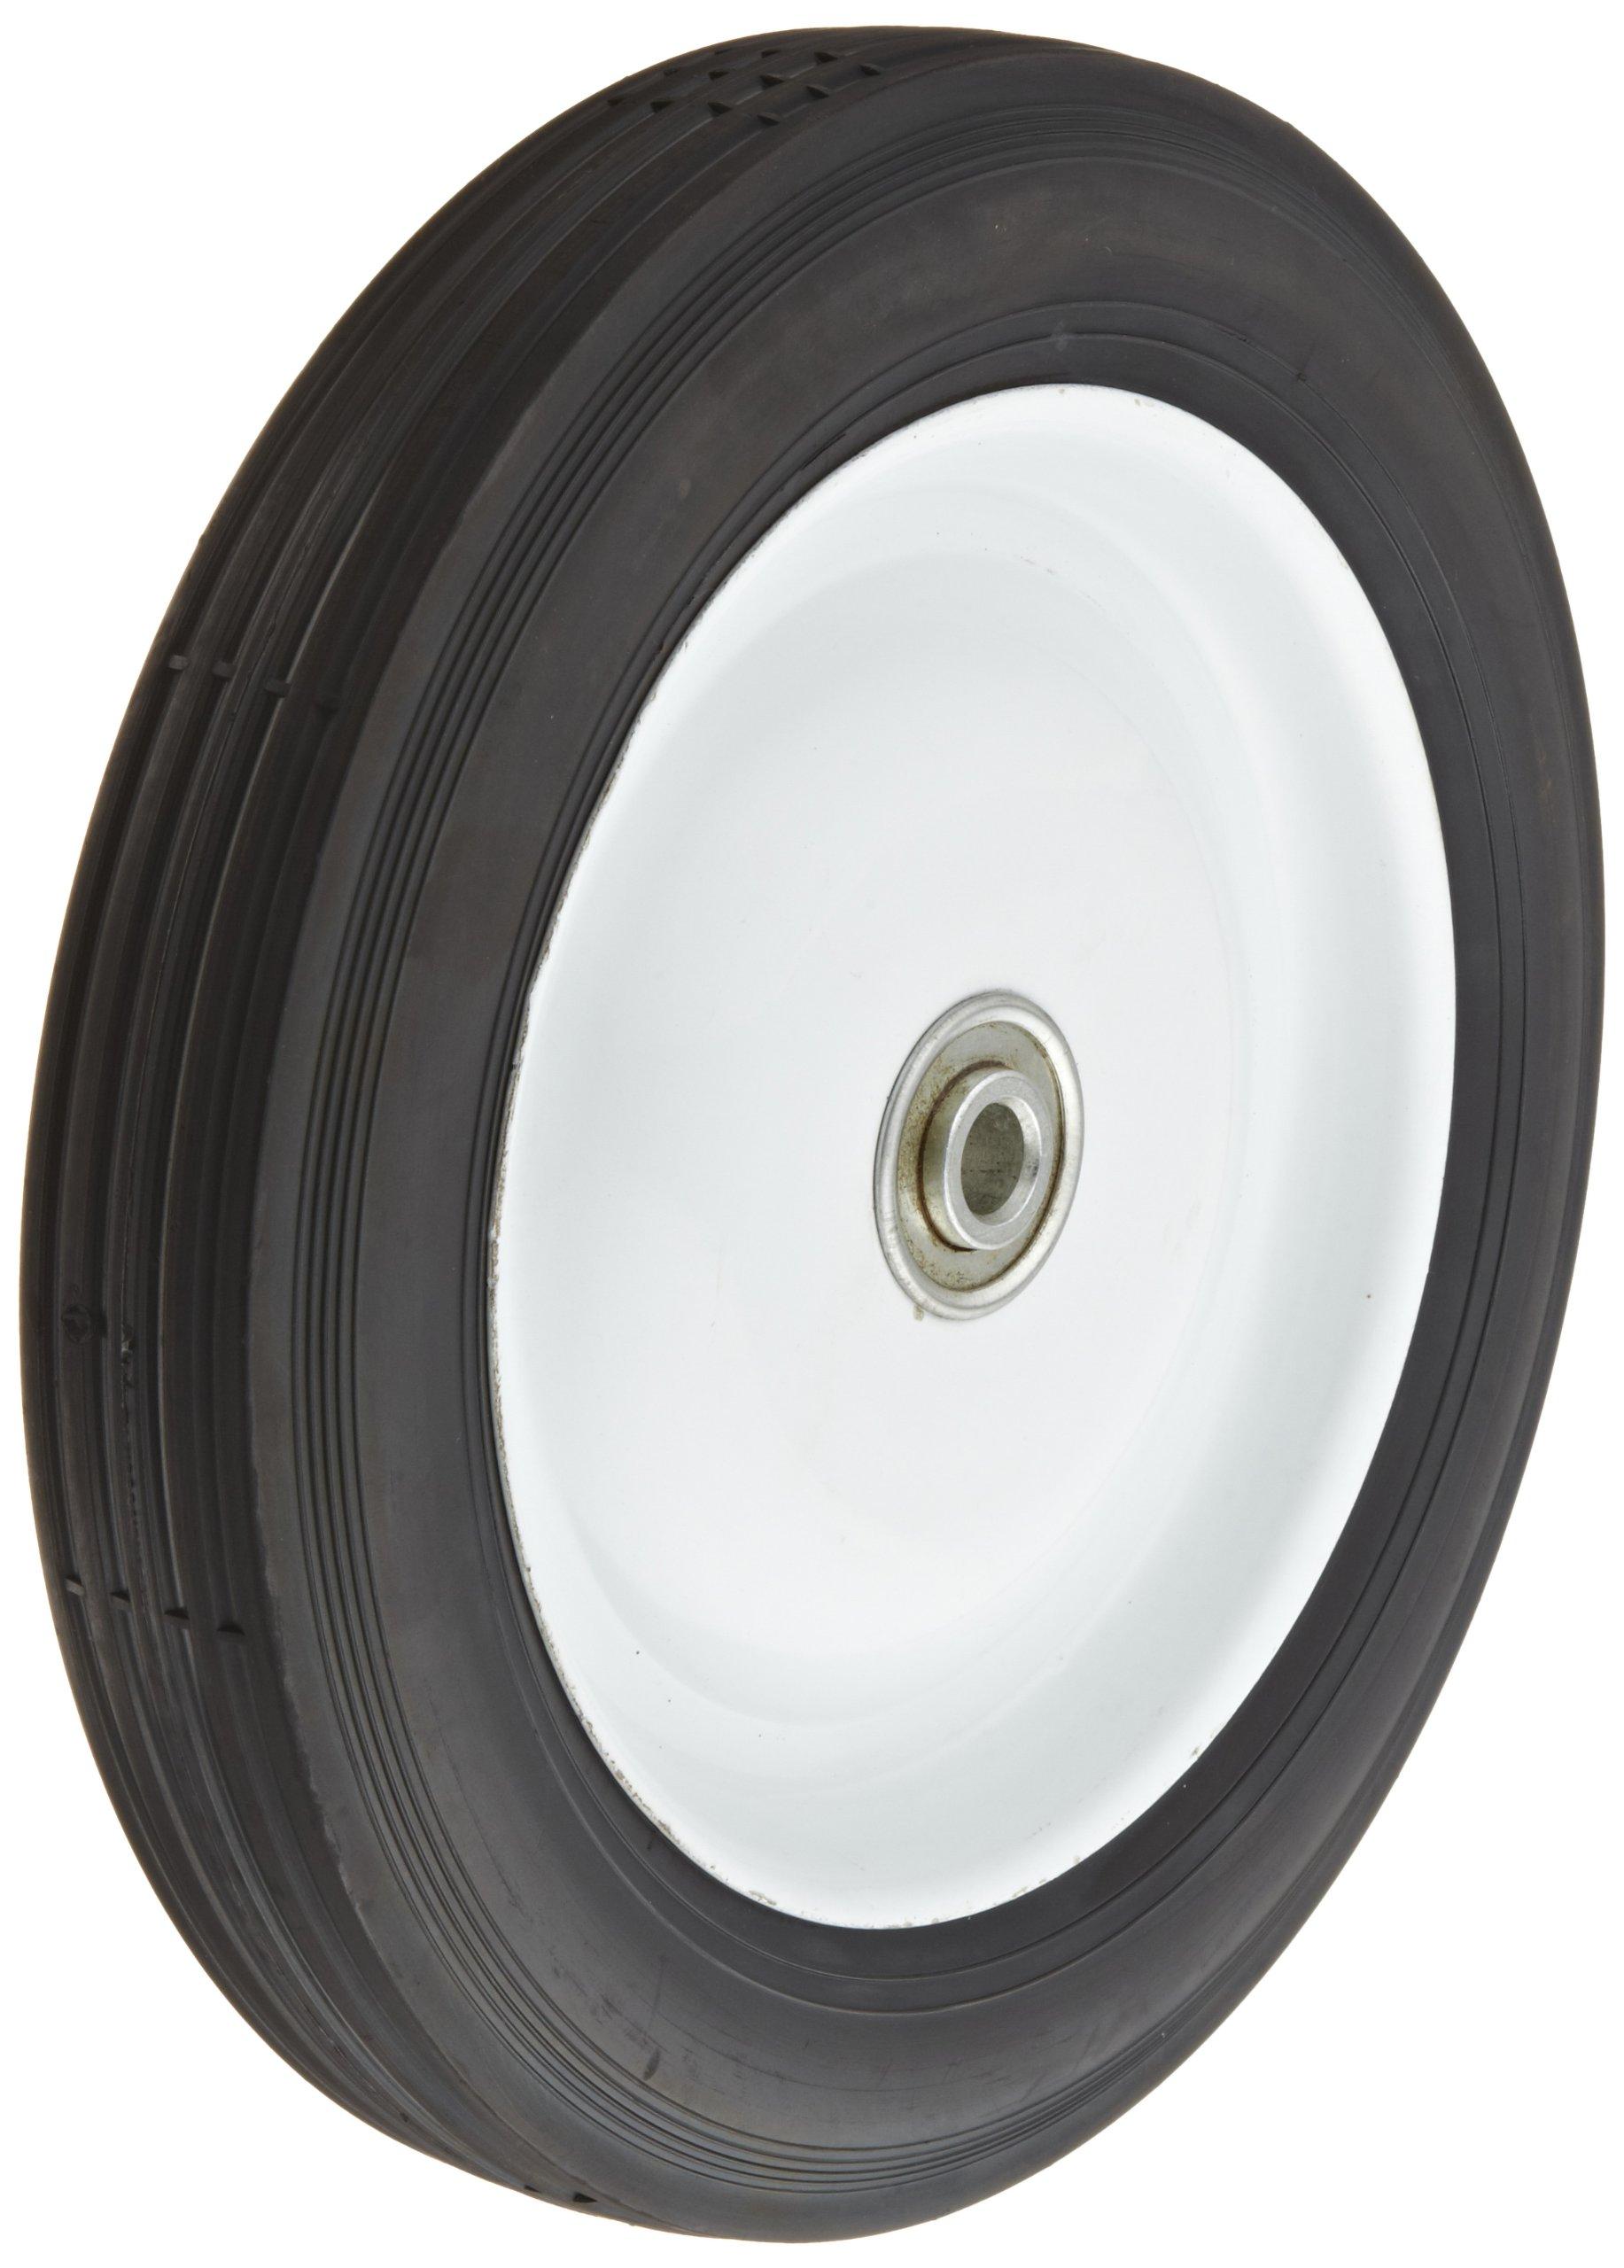 RWM Casters SNB-1017-08 Wheel with Semi-pneumatic Tire, 10'' Diameter, 1.75'' Width, 1/2'' Axle Hole Diameter